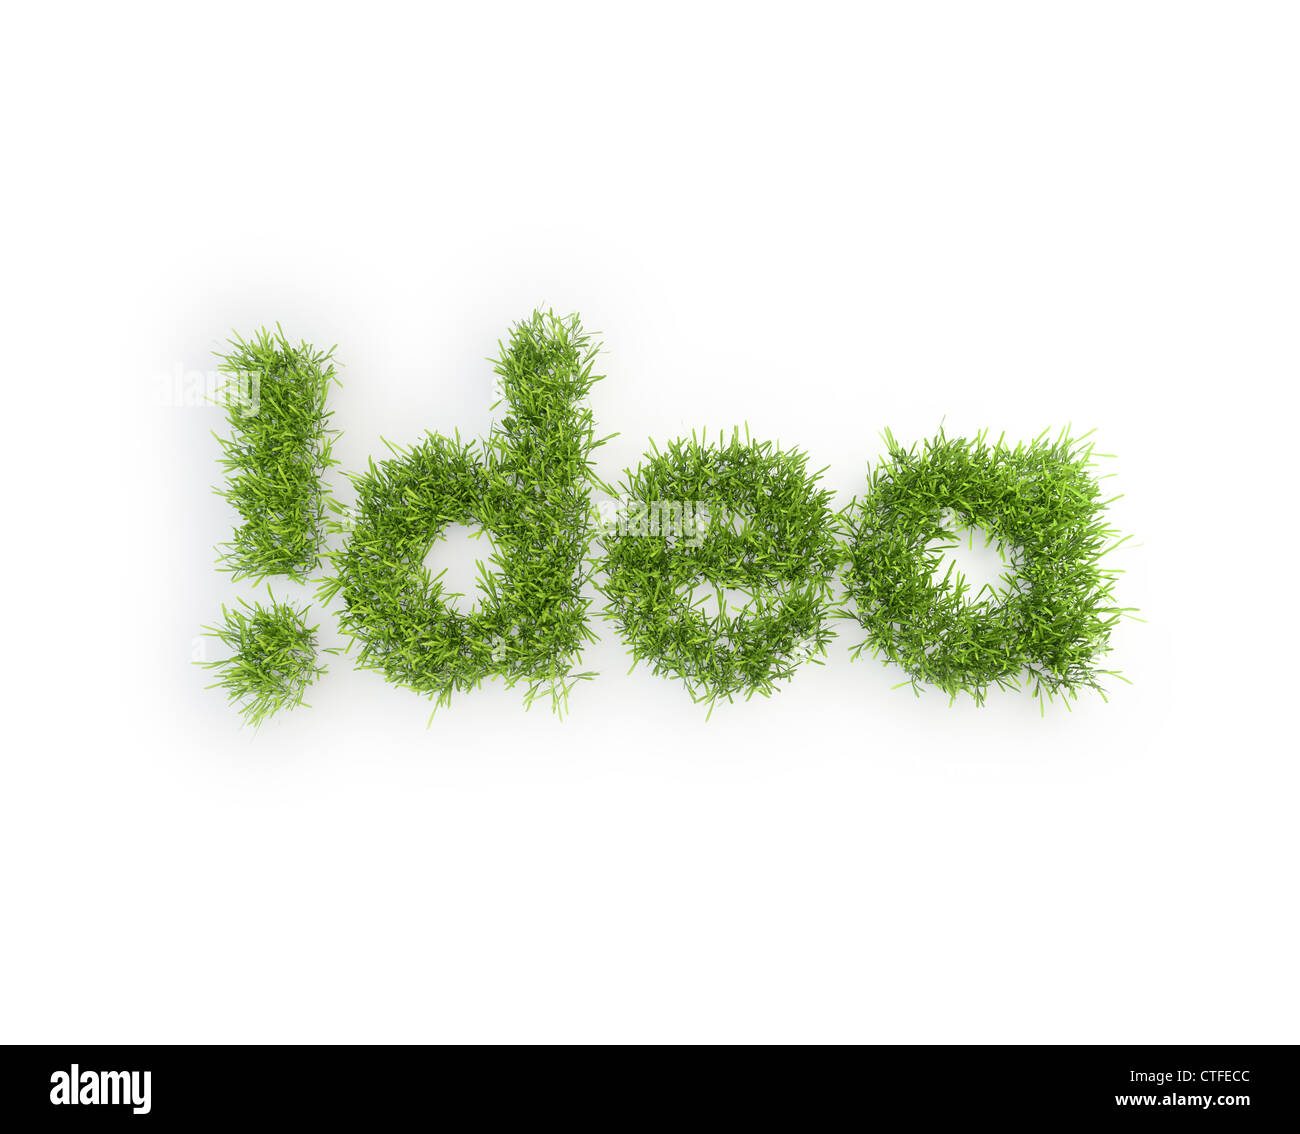 Idee Grass Patch - Kreativität-Konzept Stockbild